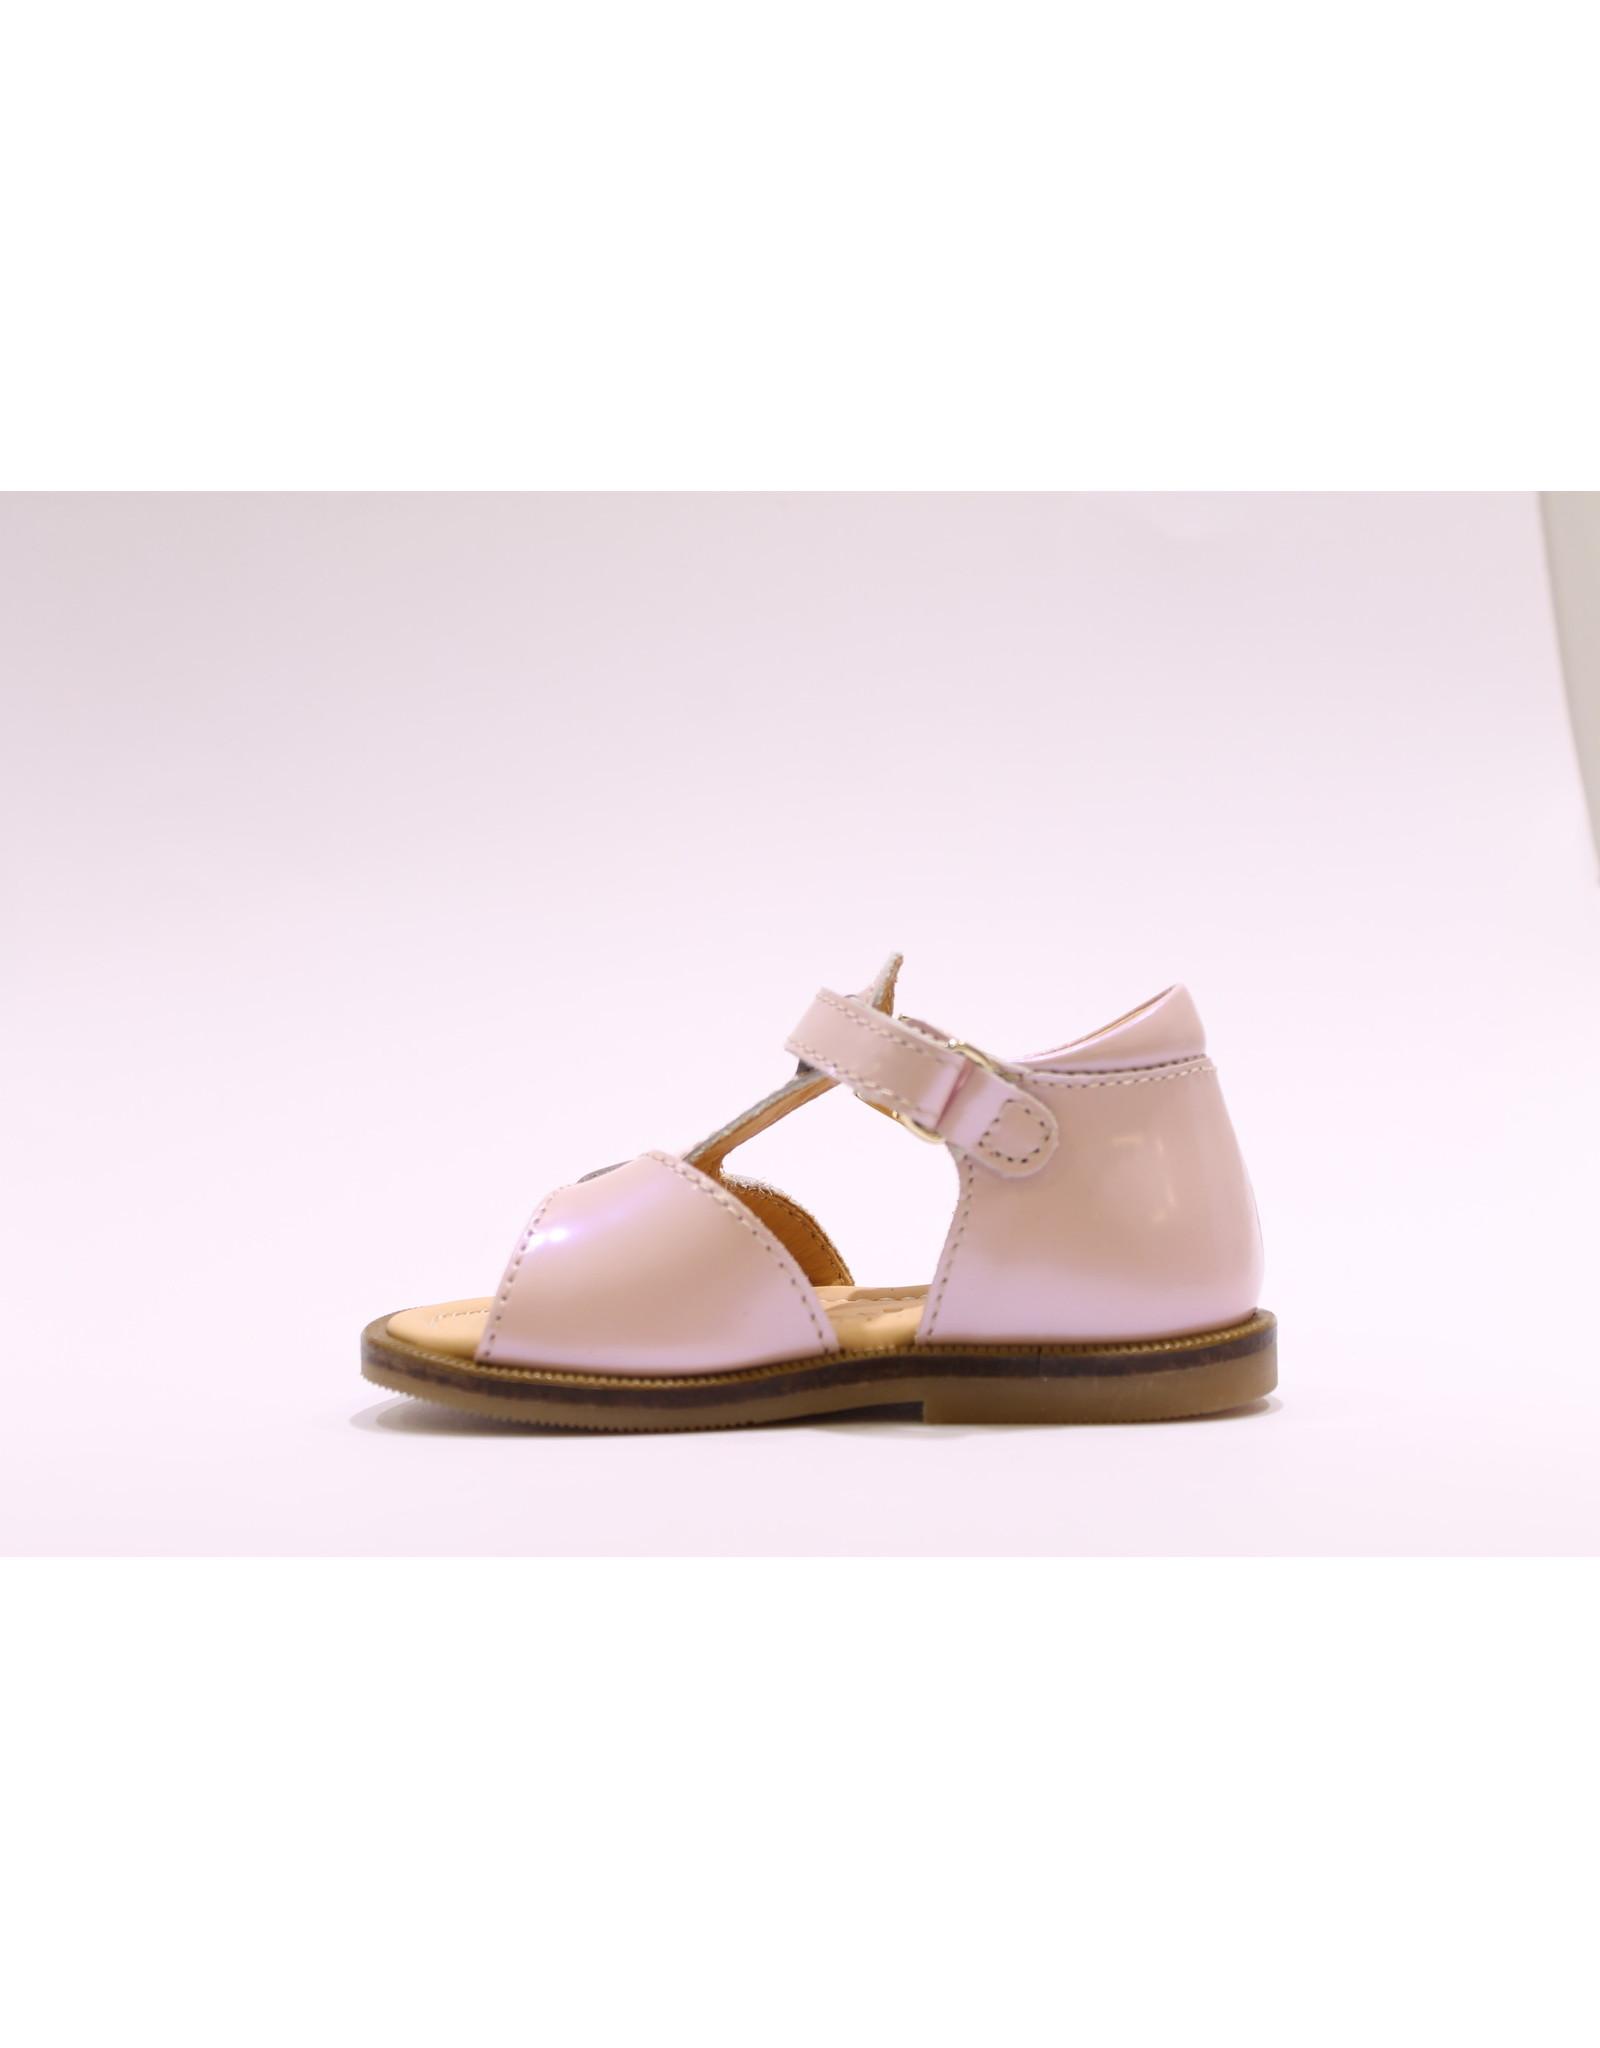 Ocra sandaal roze parelmour lak